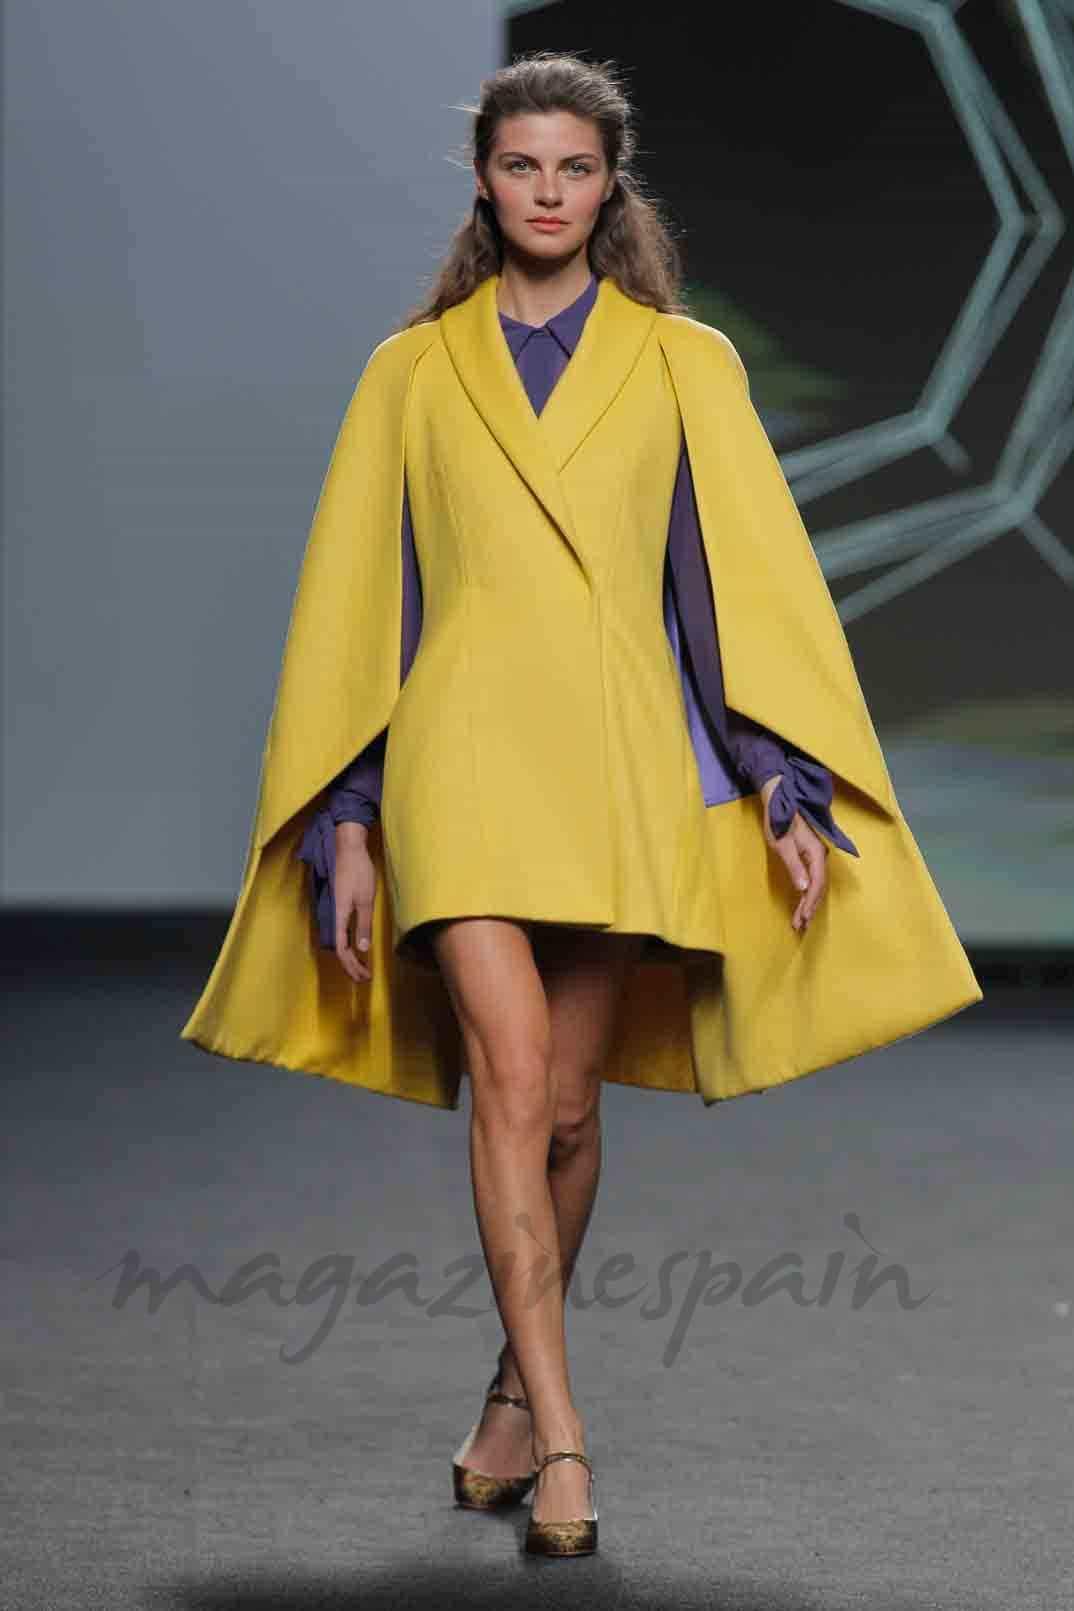 mercedes fashion week otono invierno teresa Helbig